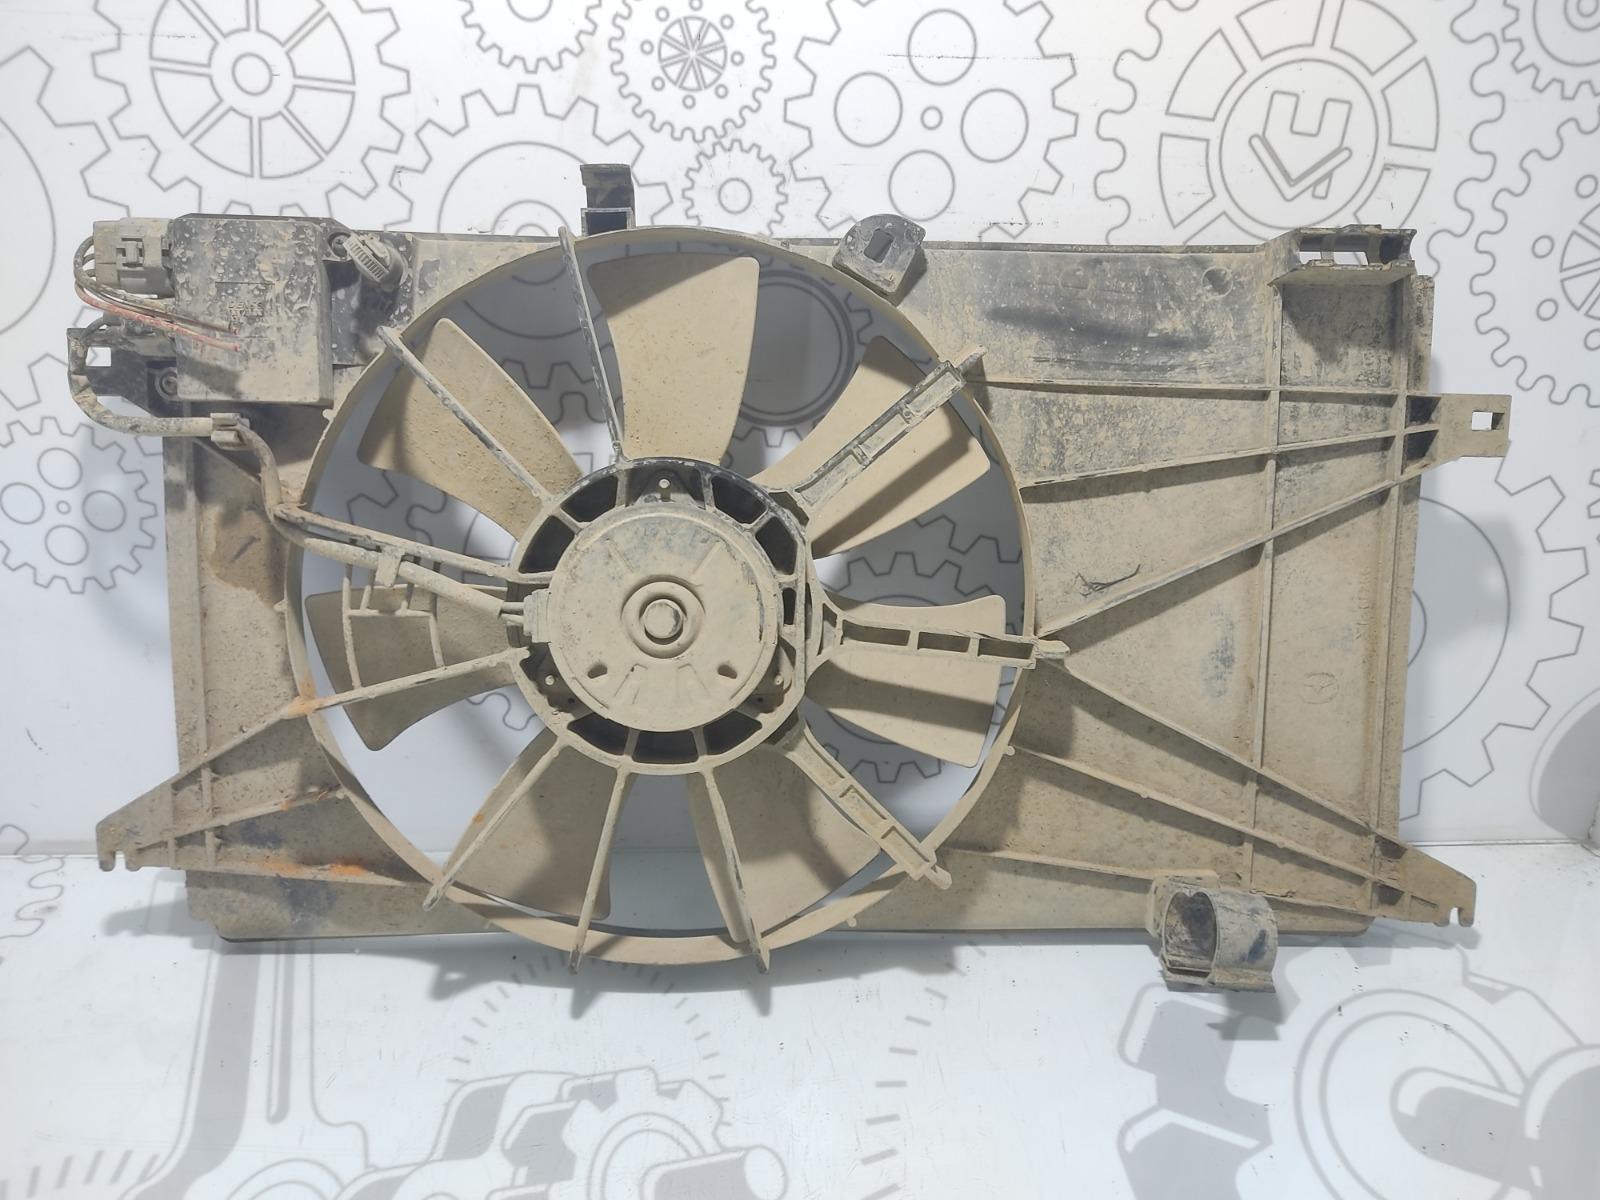 Вентилятор радиатора Mazda 5 2.0 TD 2006 (б/у)